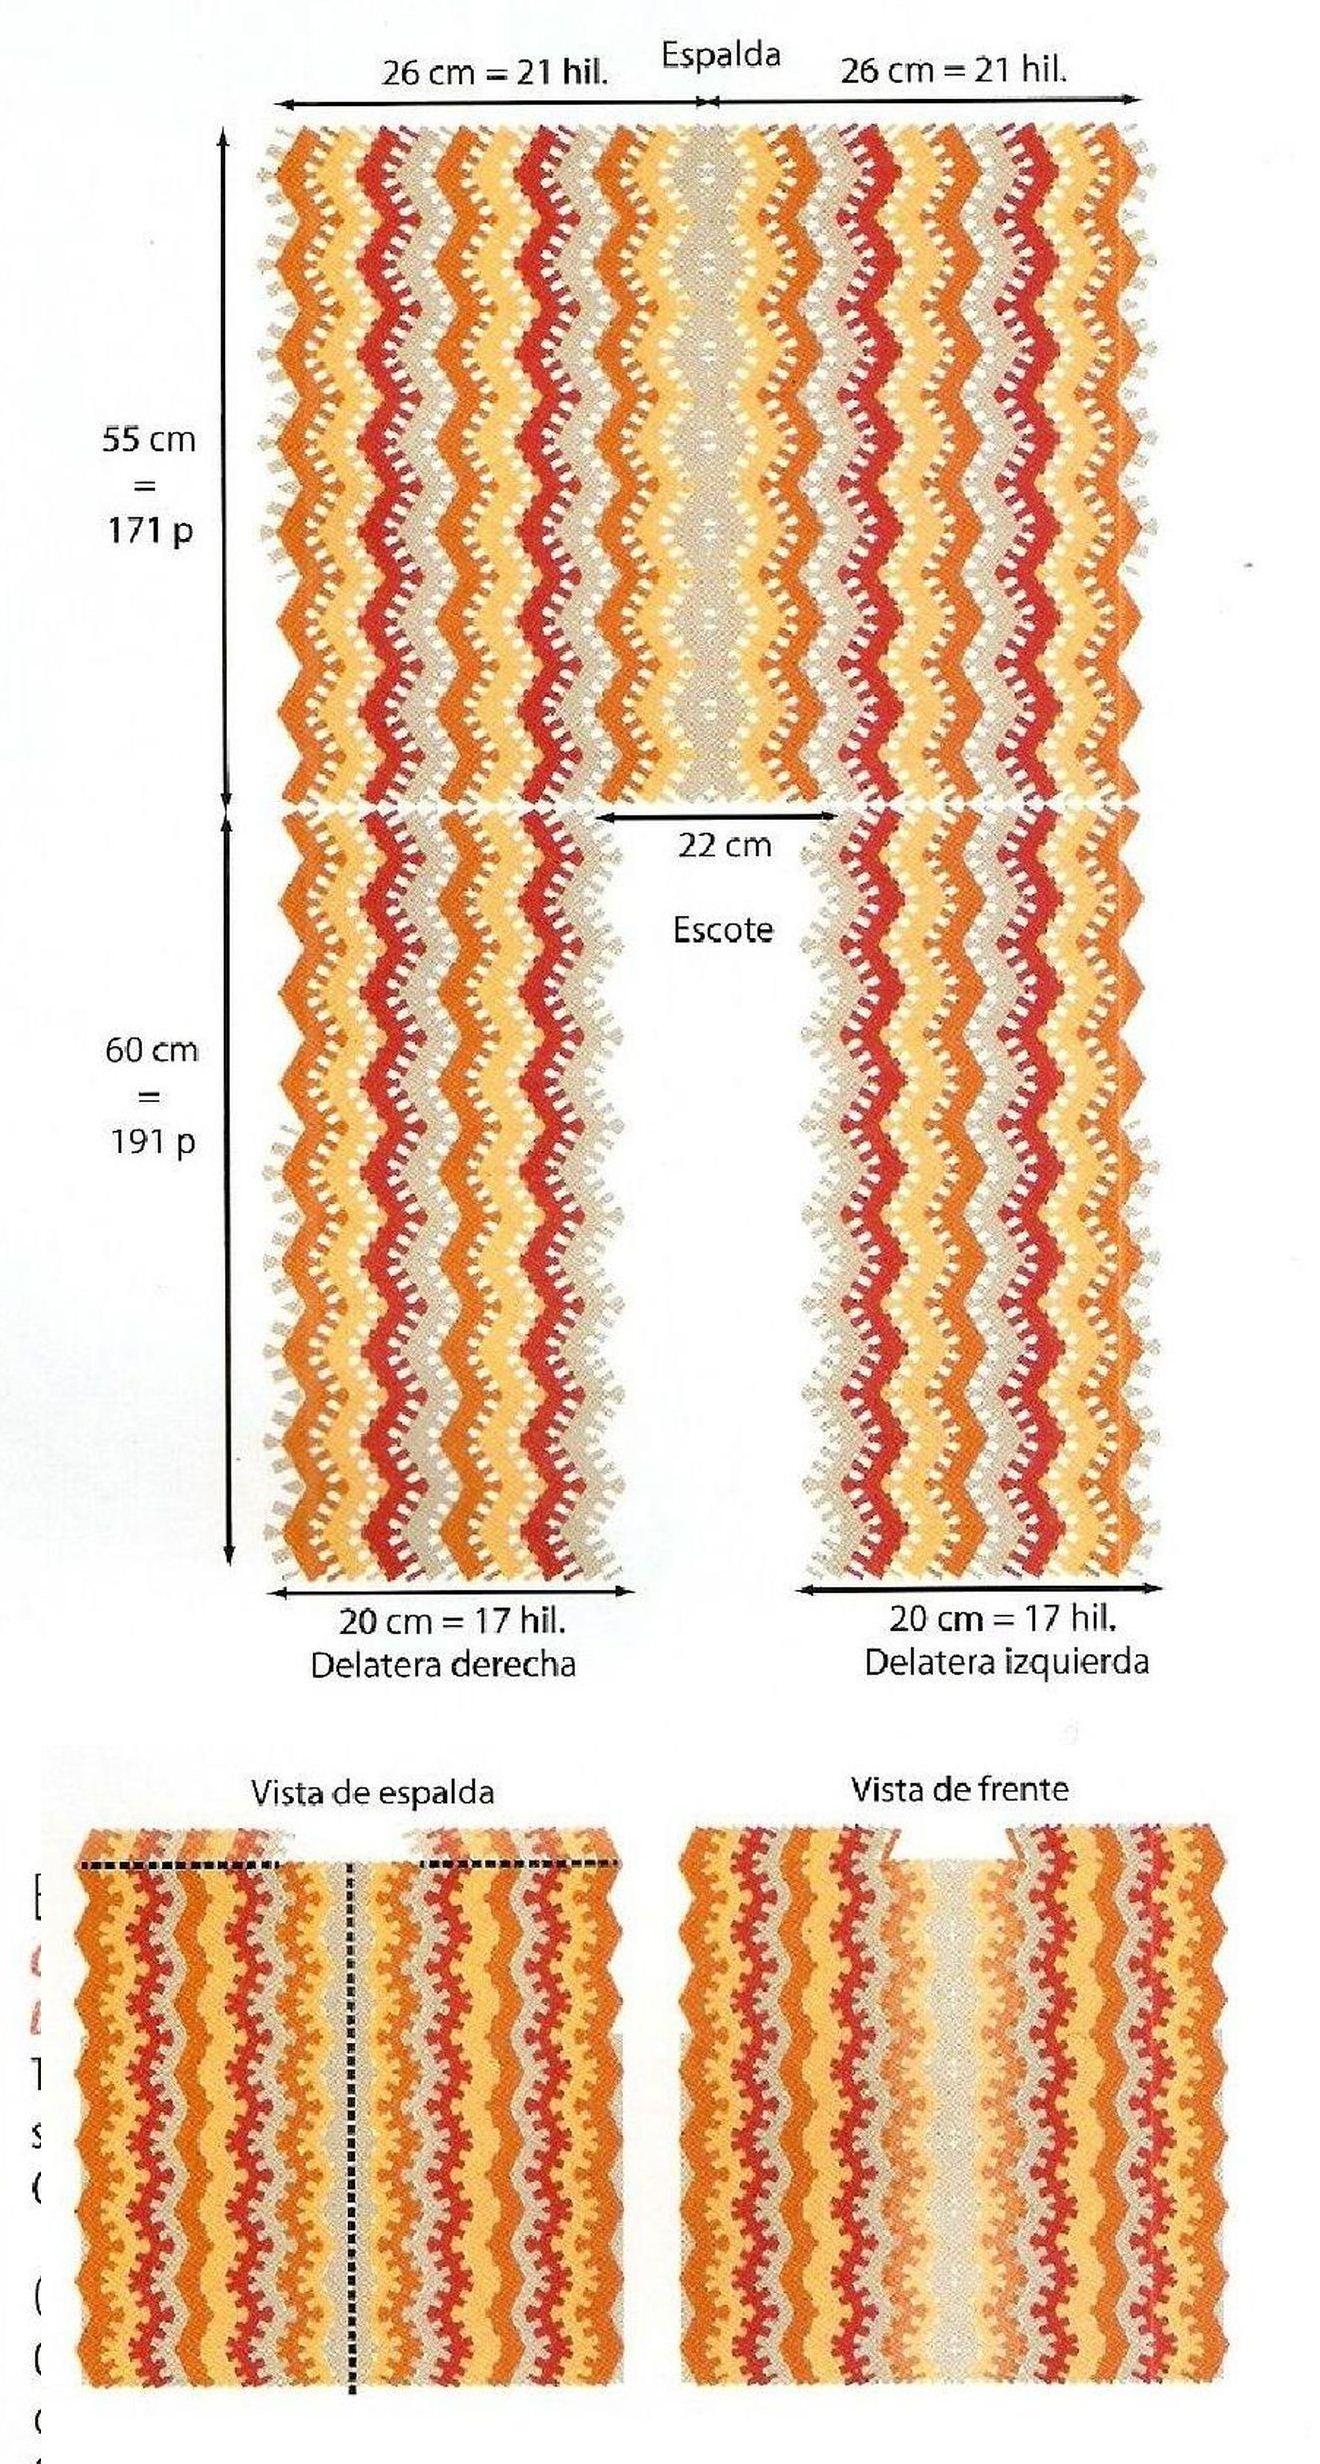 1175_Crochet #1 (13)